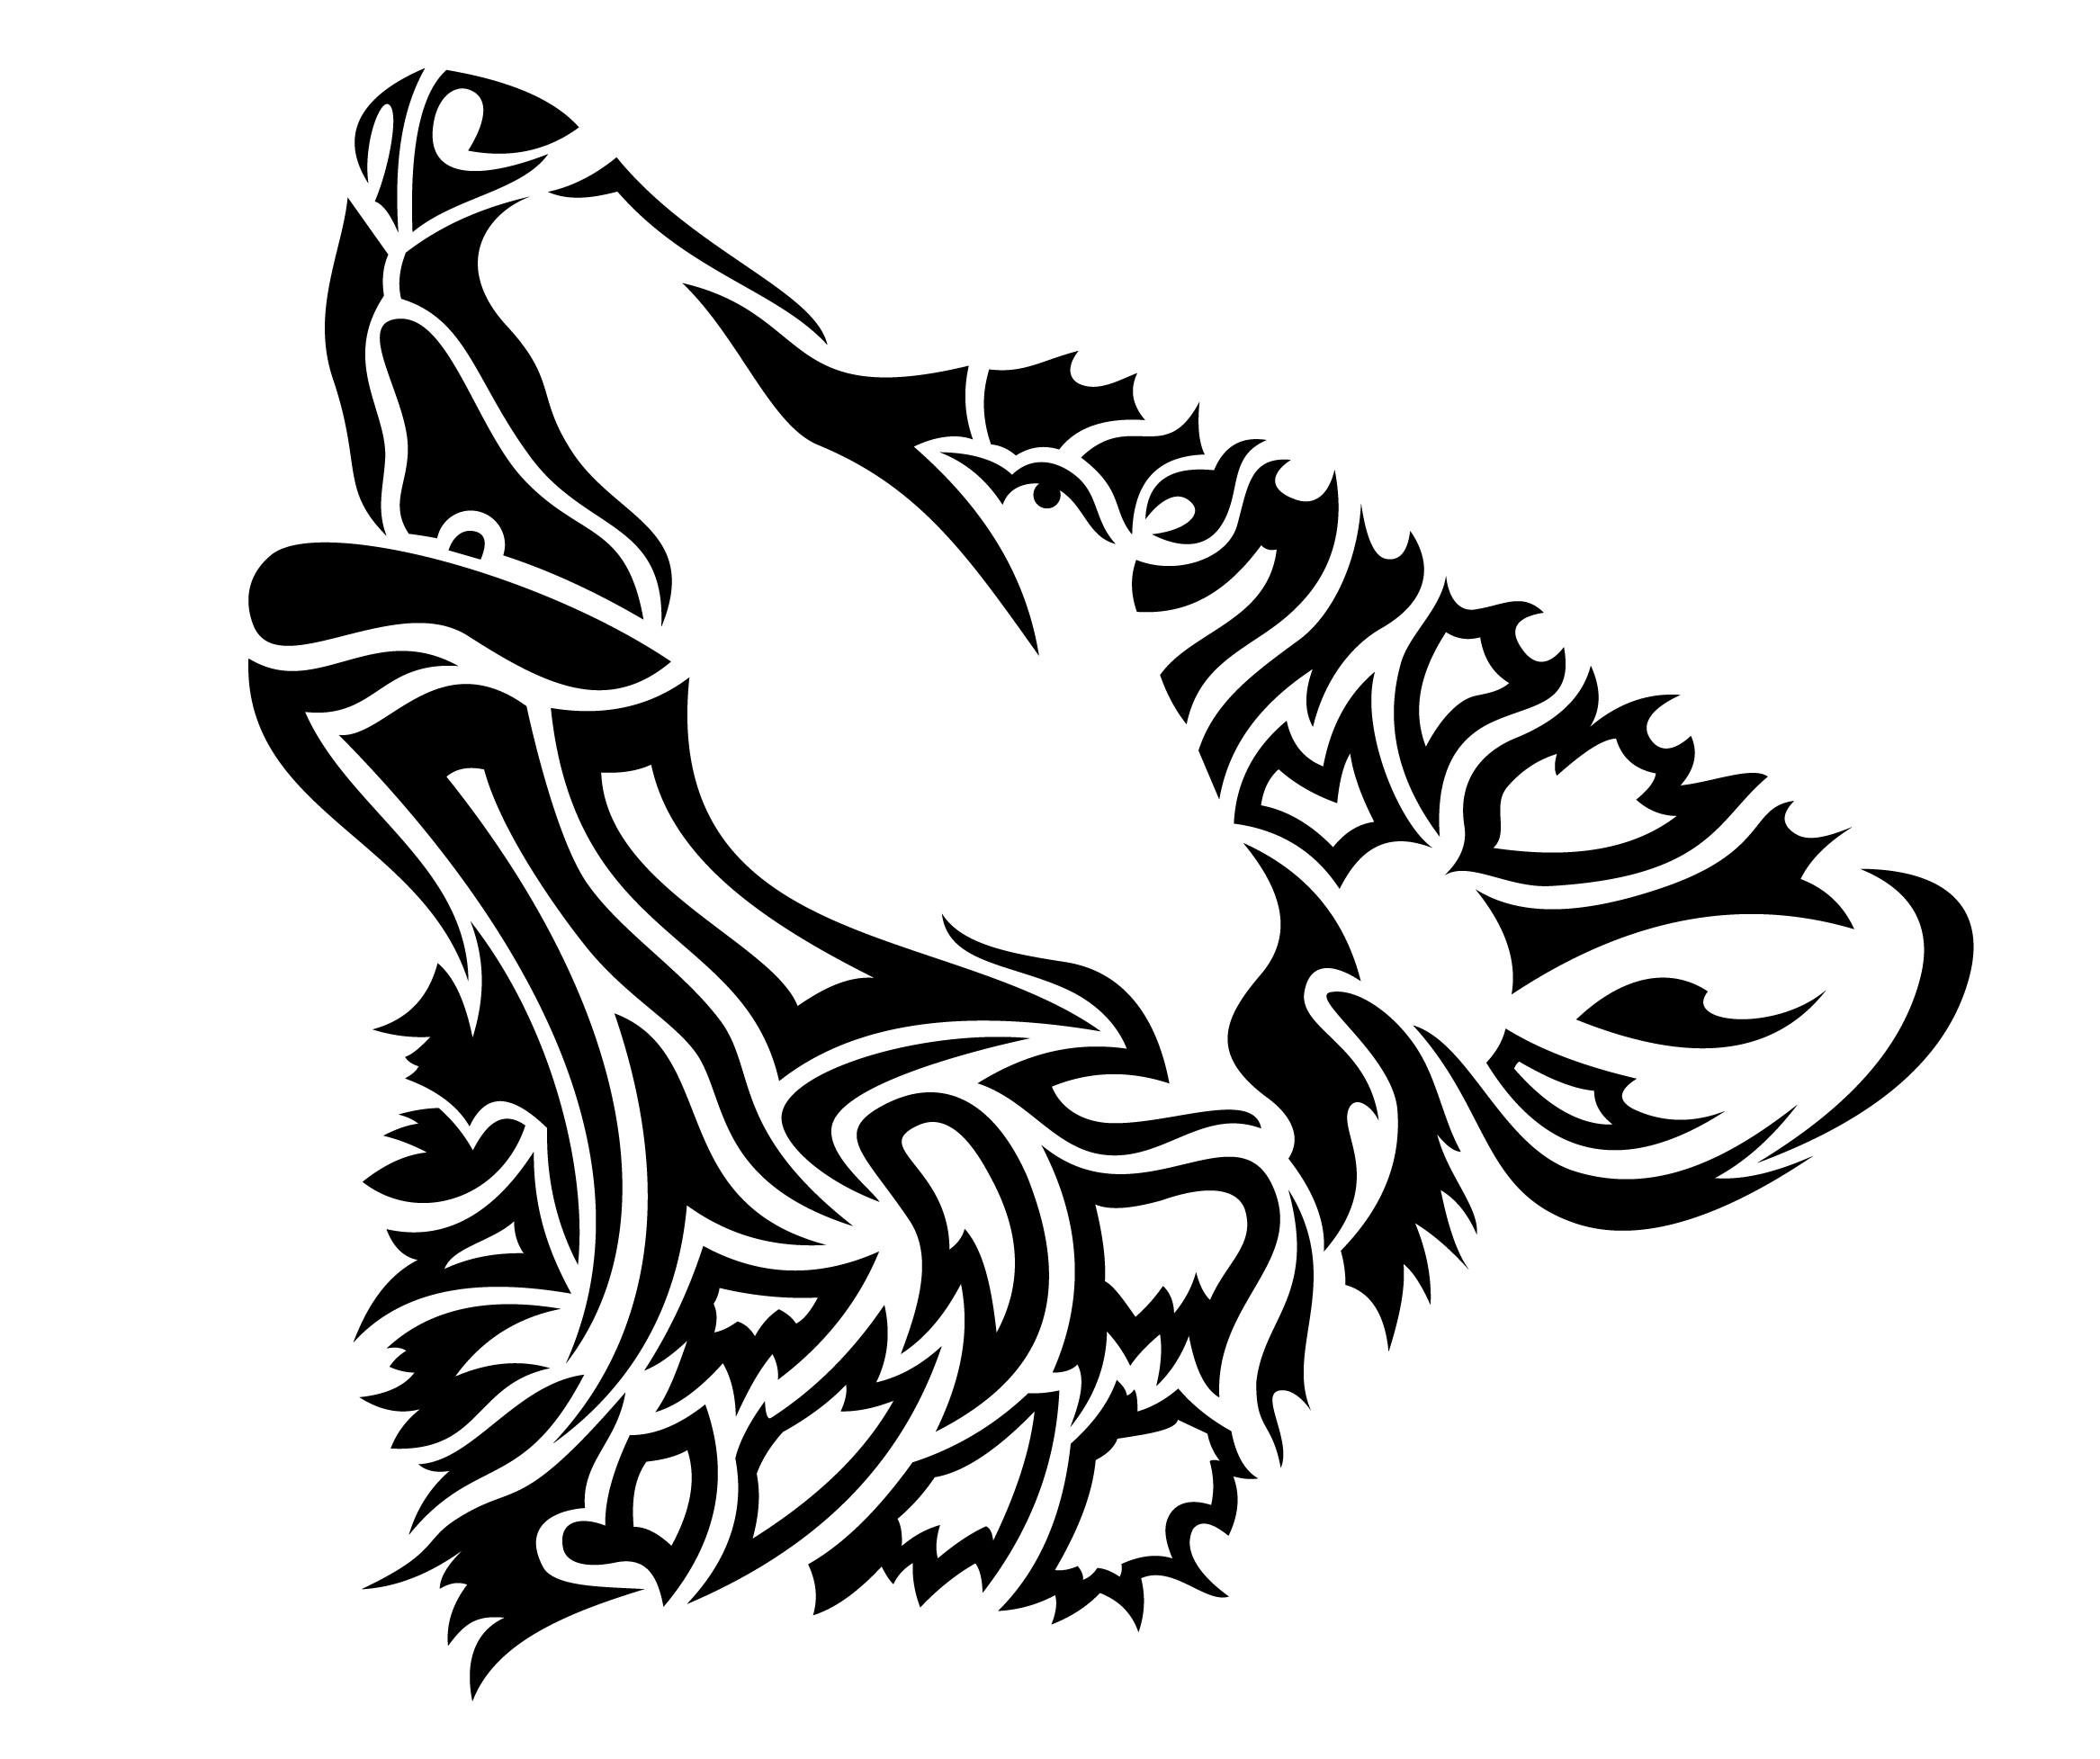 Wallpapers Tribal Animals Animal Tattoo 1024x1024: Free Tribal Animal, Download Free Clip Art, Free Clip Art